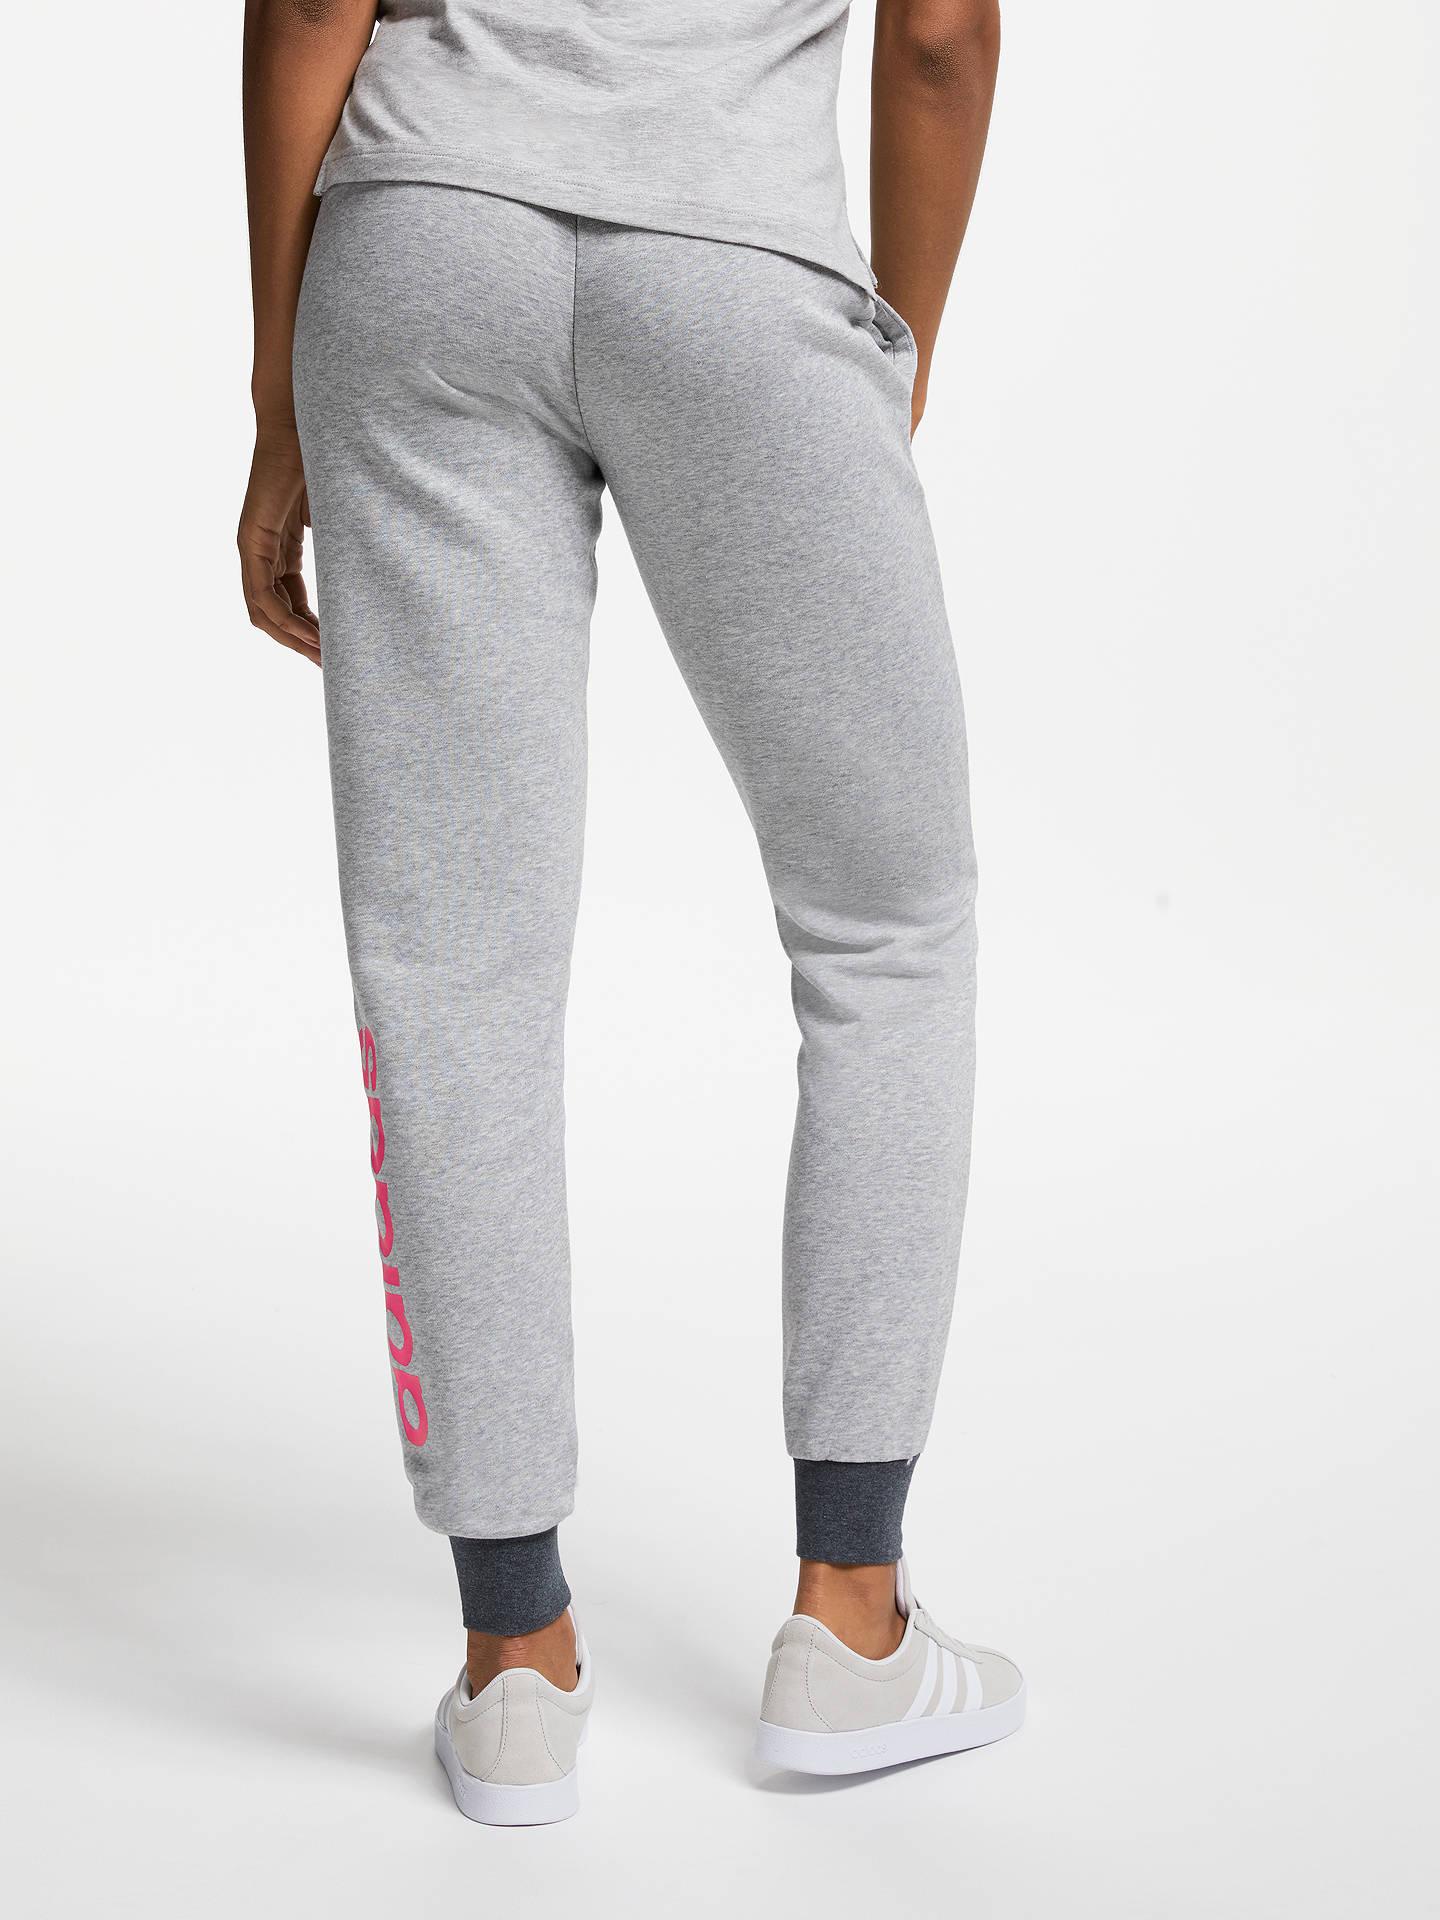 cb8c9673e3cc7 ... Buy adidas Essentials Linear Tracksuit Bottoms, Medium Grey Heather/Prism  Pink, XS Online ...